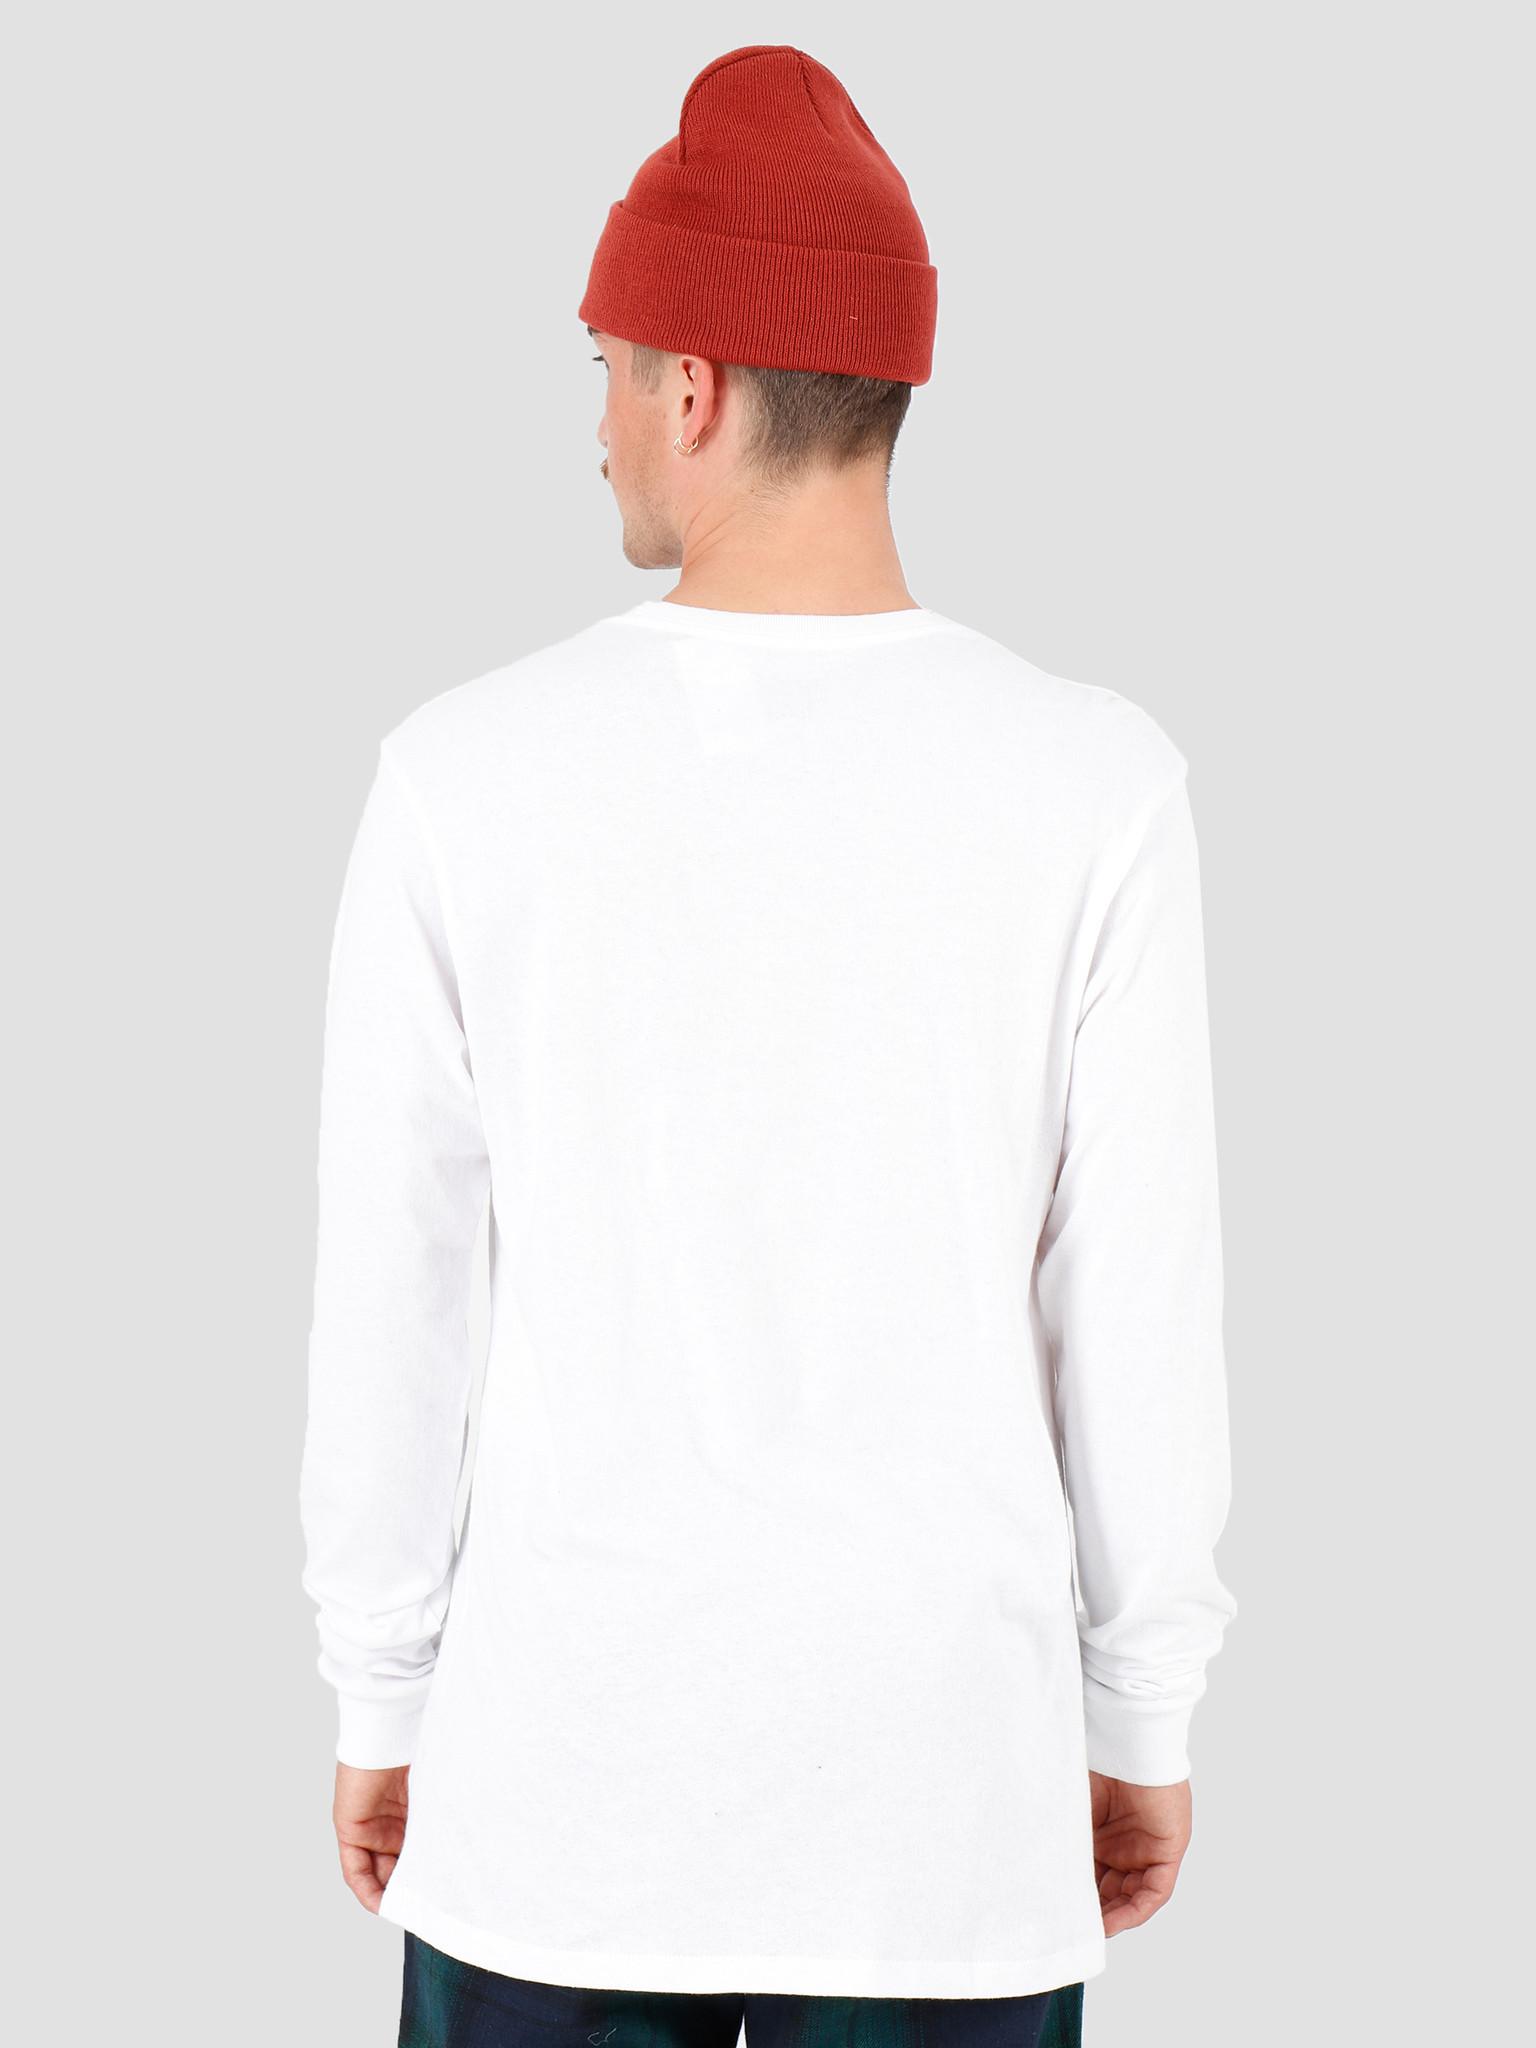 HUF HUF Sedona Longsleeve Pocket T-Shirt White TS00876-WHITE